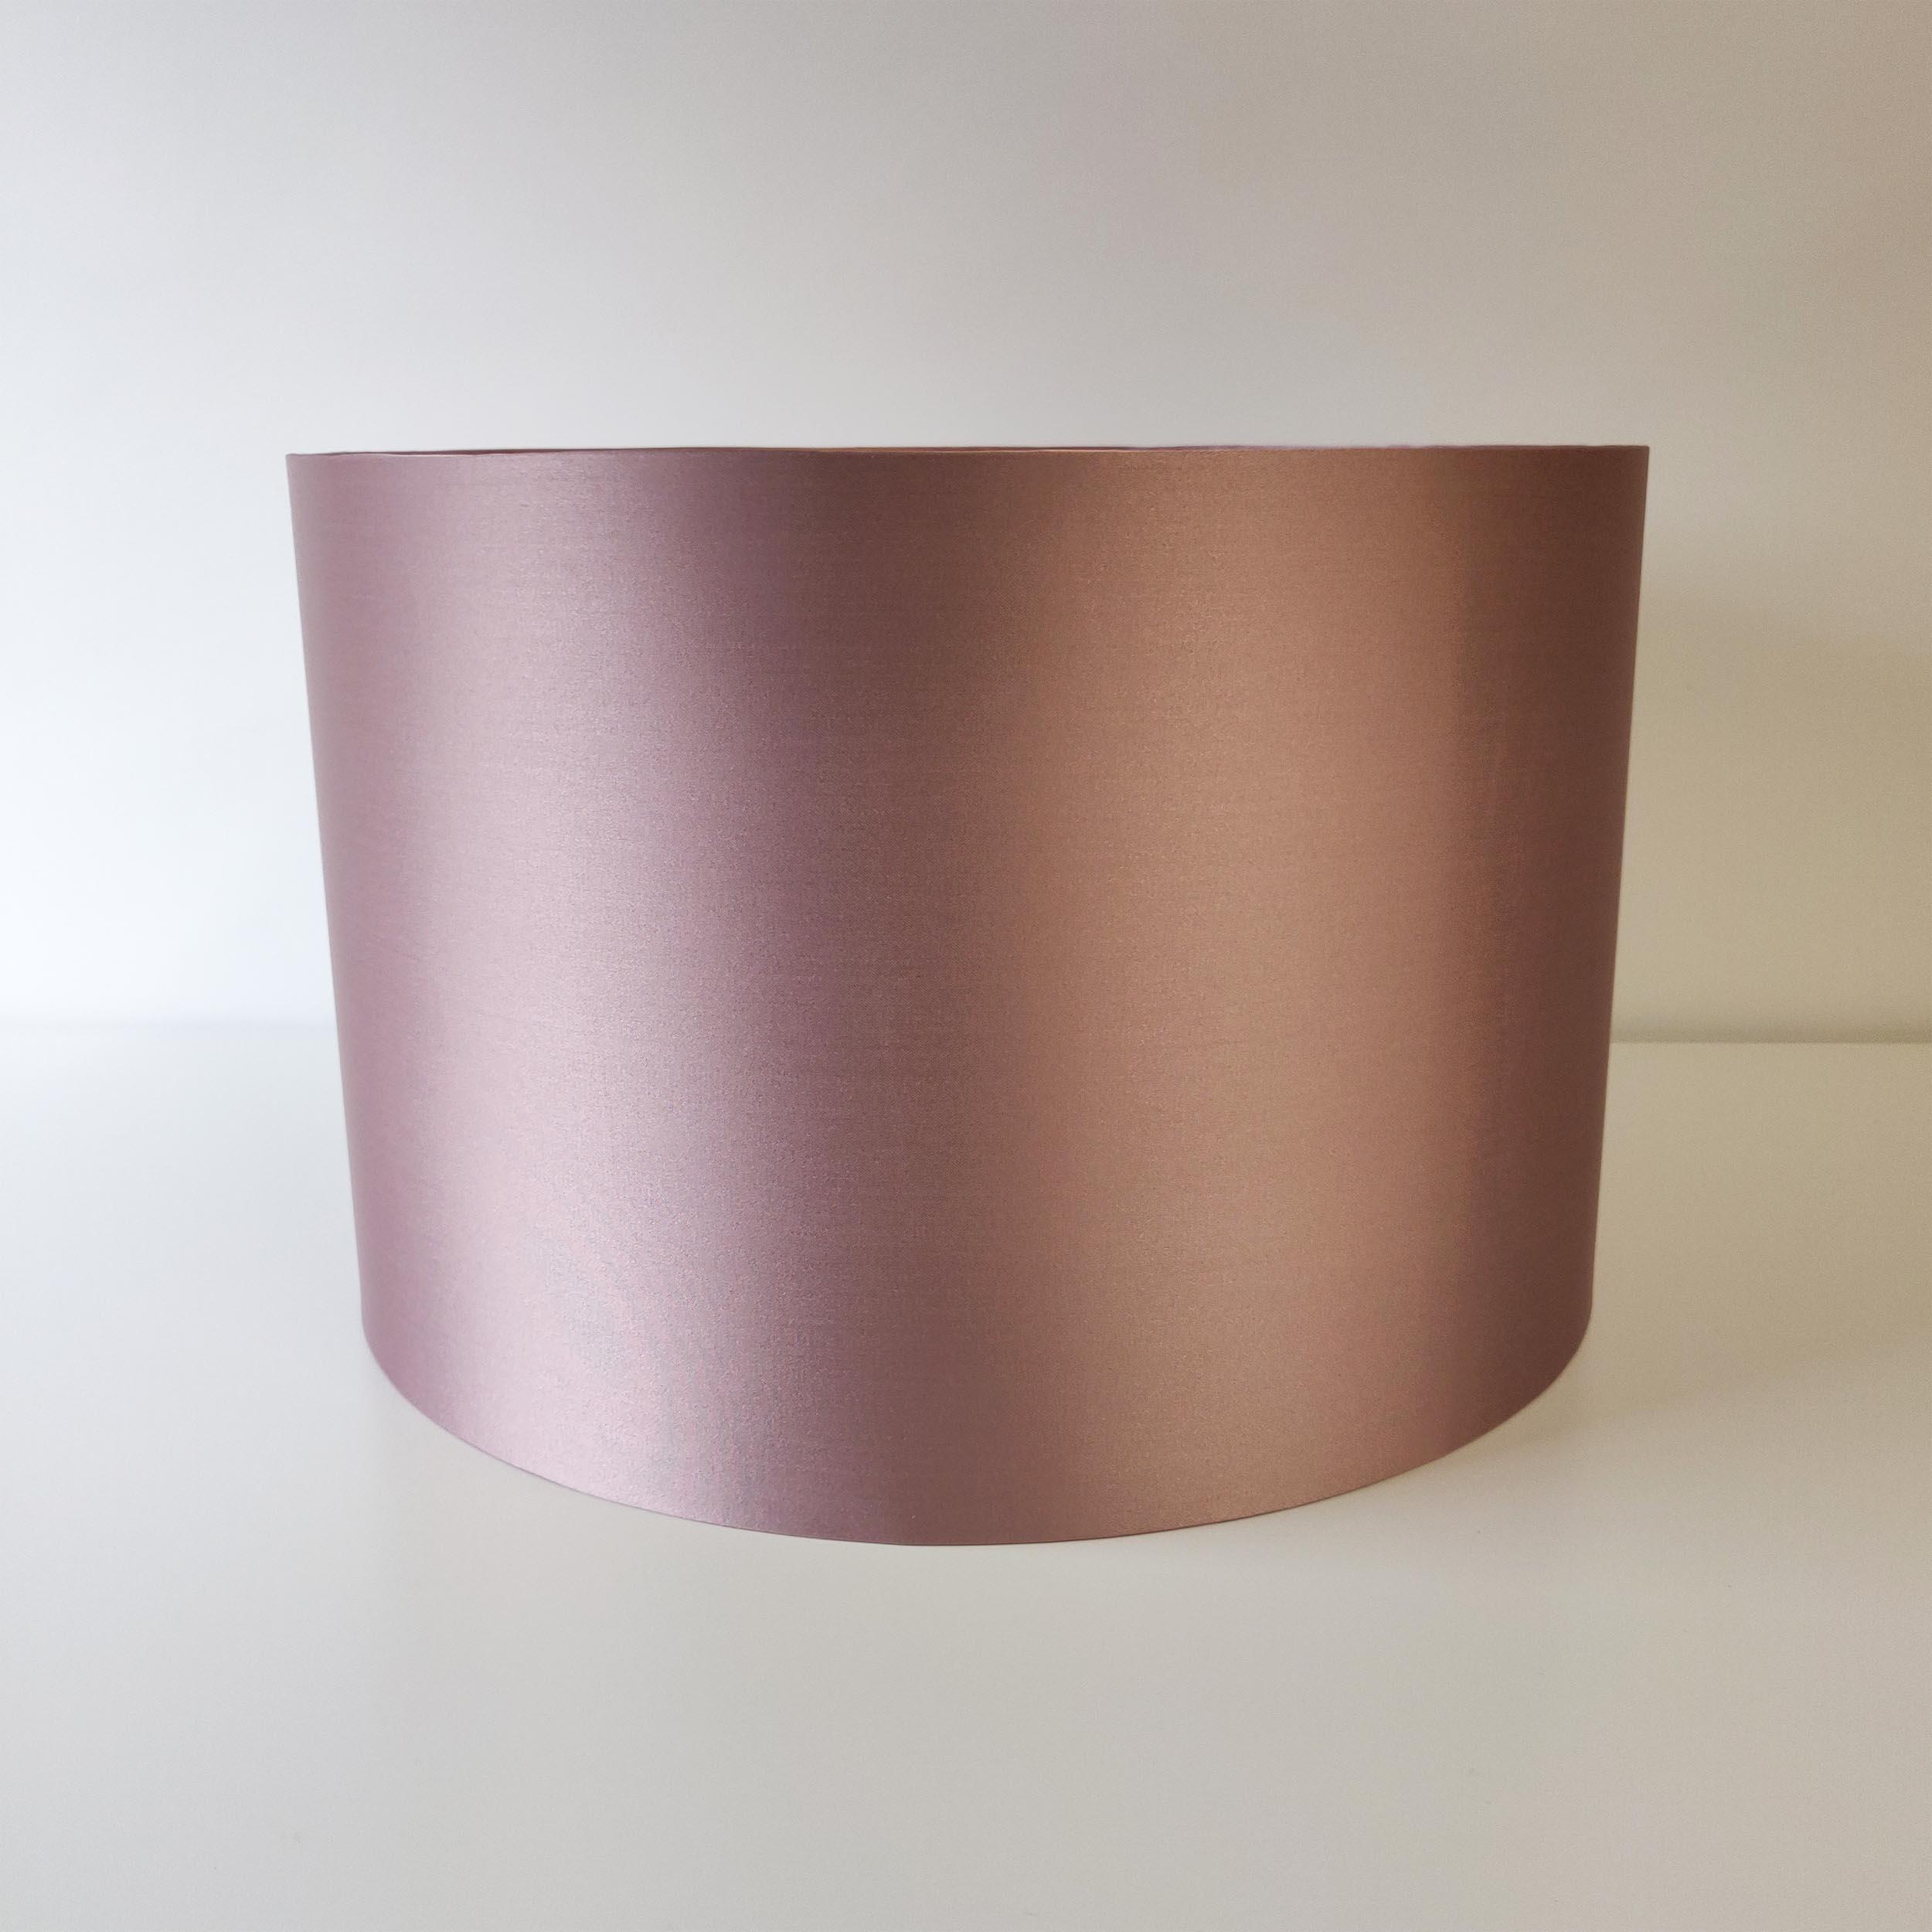 Light Pink Satin Lampshade